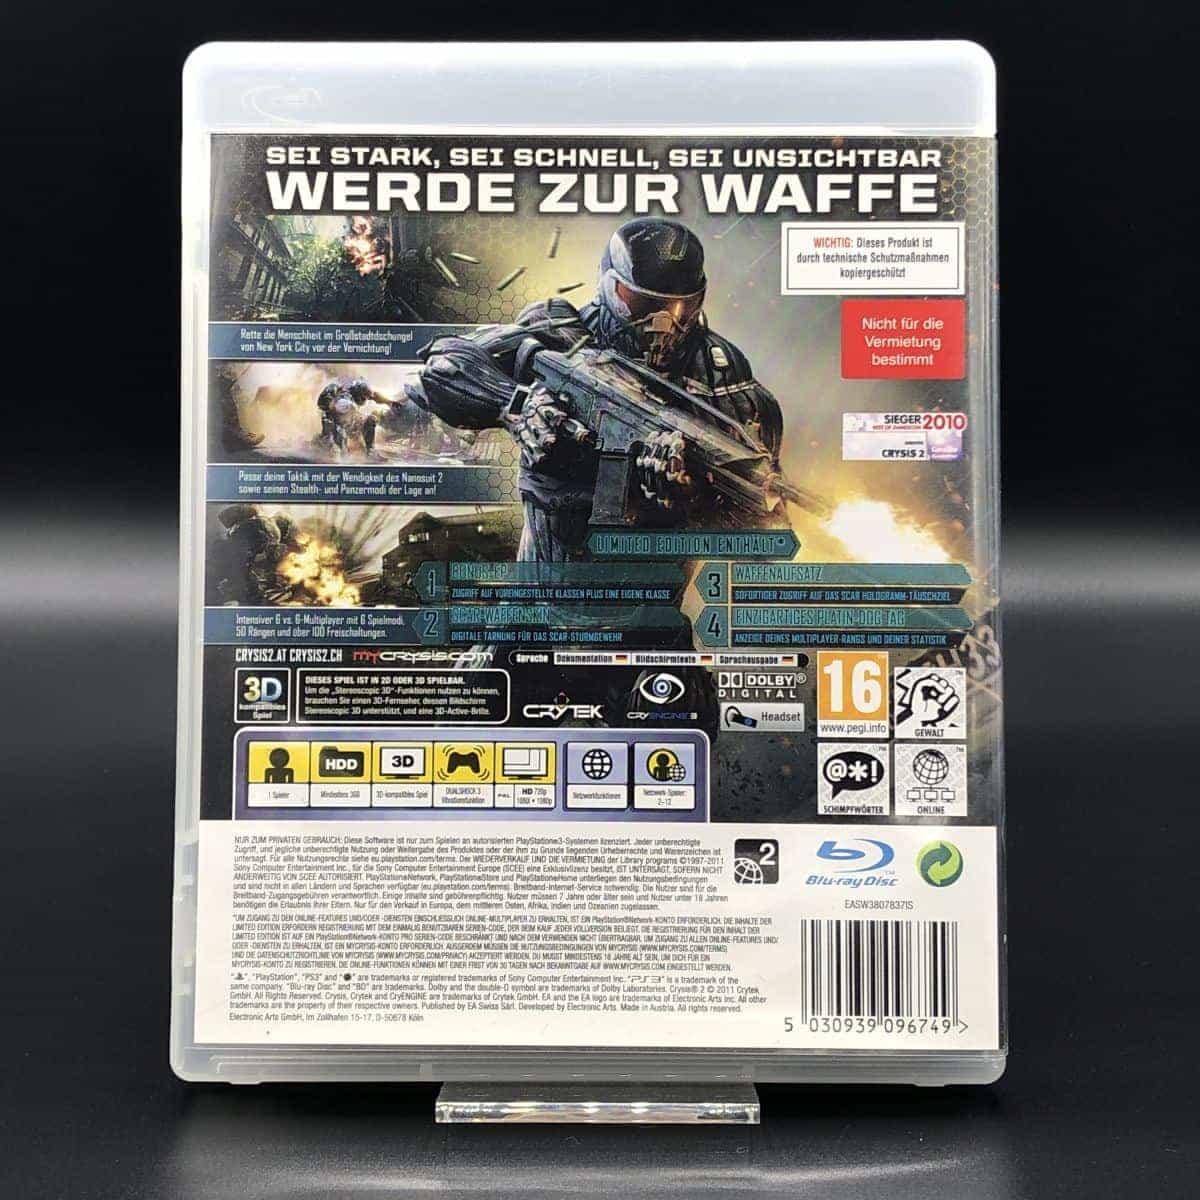 PS3 Crysis 2 (Limited Edition) (Komplett) (Sehr gut) Sony PlayStation 3 (FSK18)